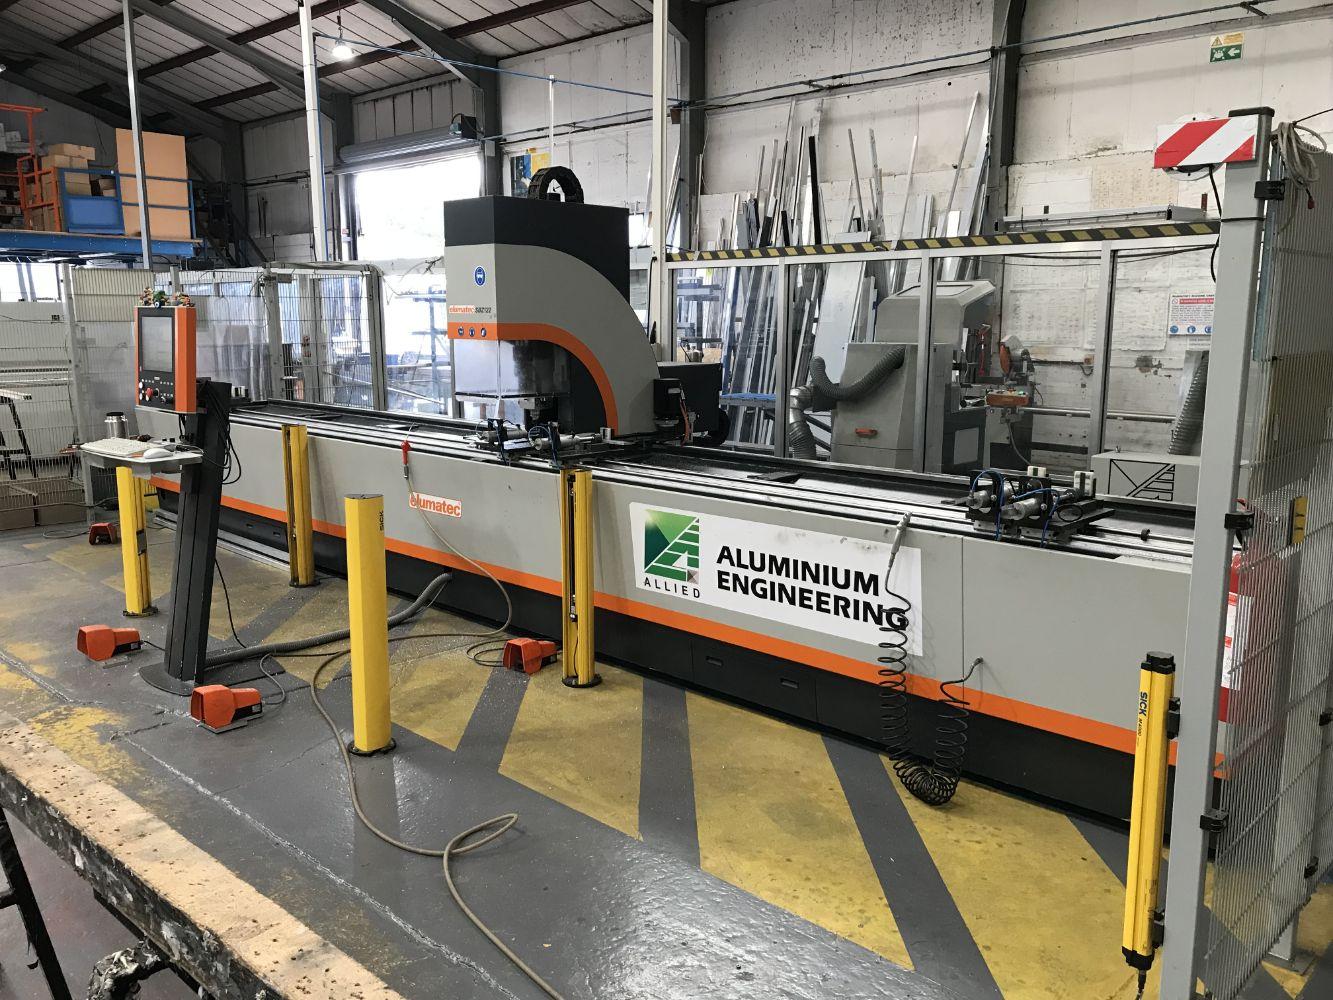 Aluminium Window, Door & Curtain Wall Manufacturing Machinery, Motor Vehicles c/w Glass Racks, Fork Lift Truck, Factory Tools & Equipment